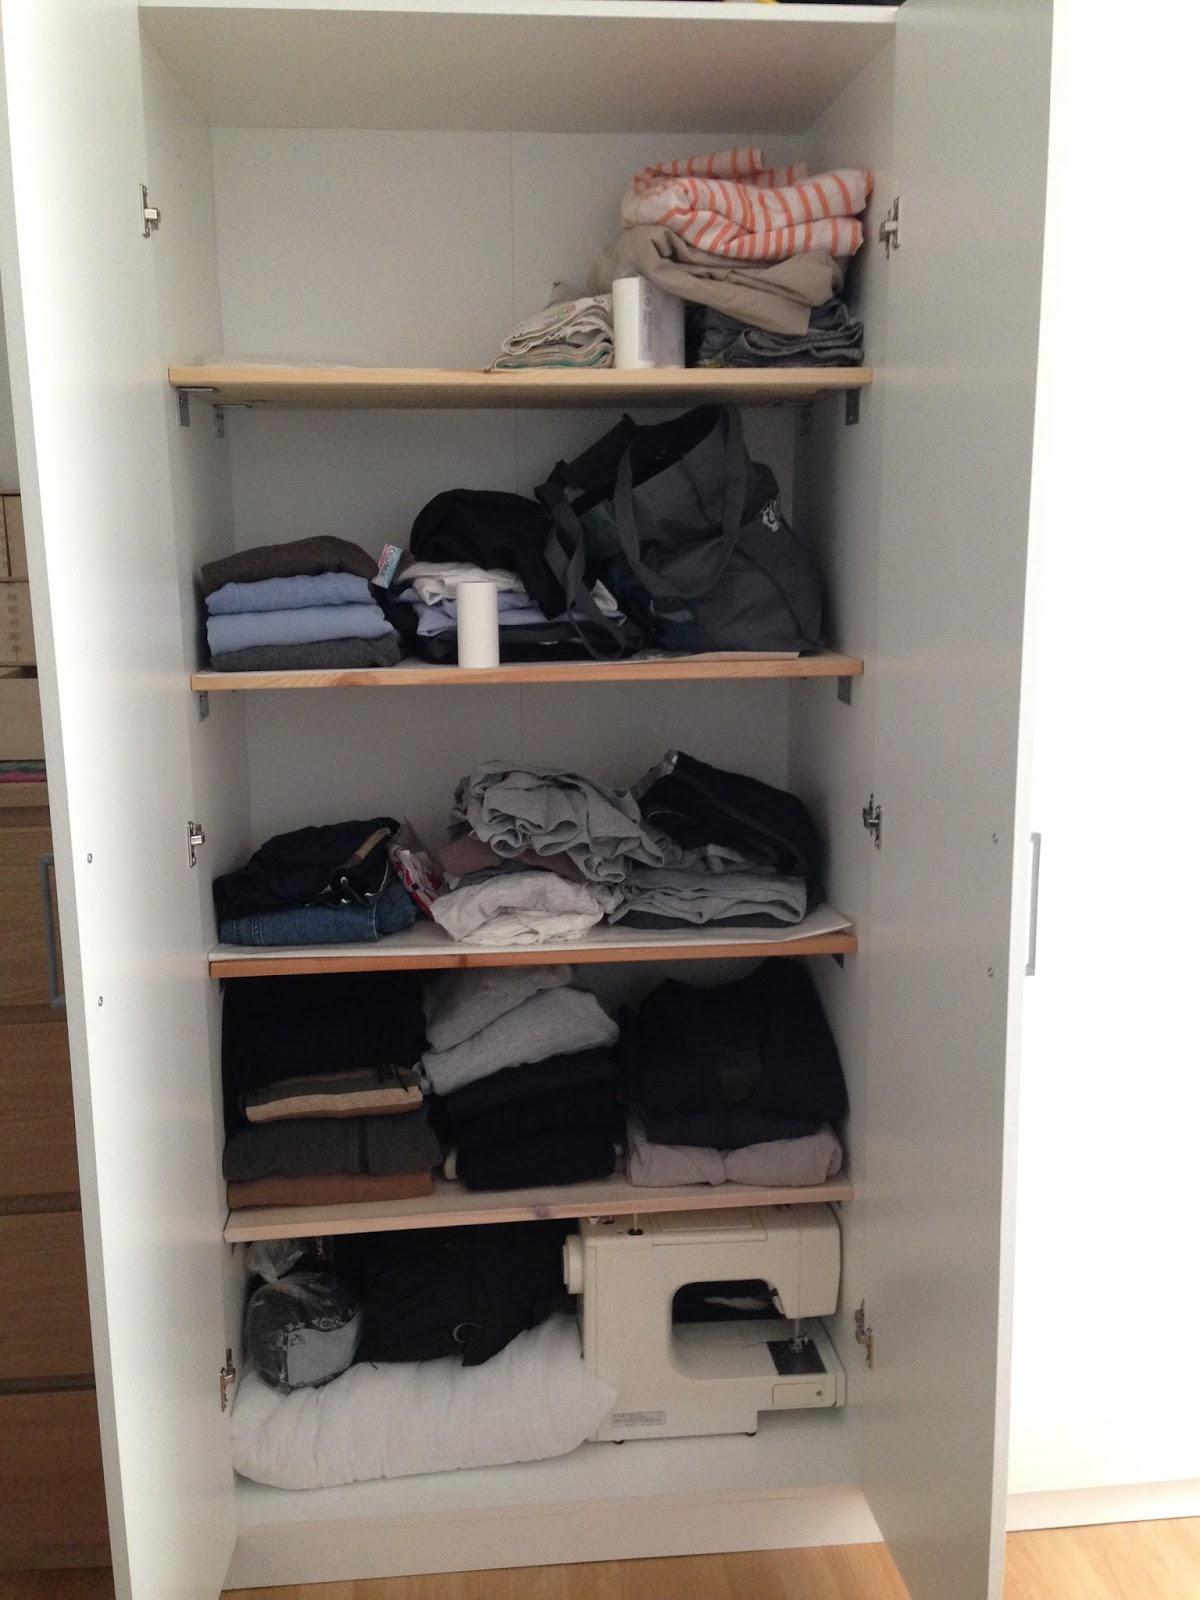 p dombas ikea wardrobe in condition bargain storage price wardrobes shelving croydon mint